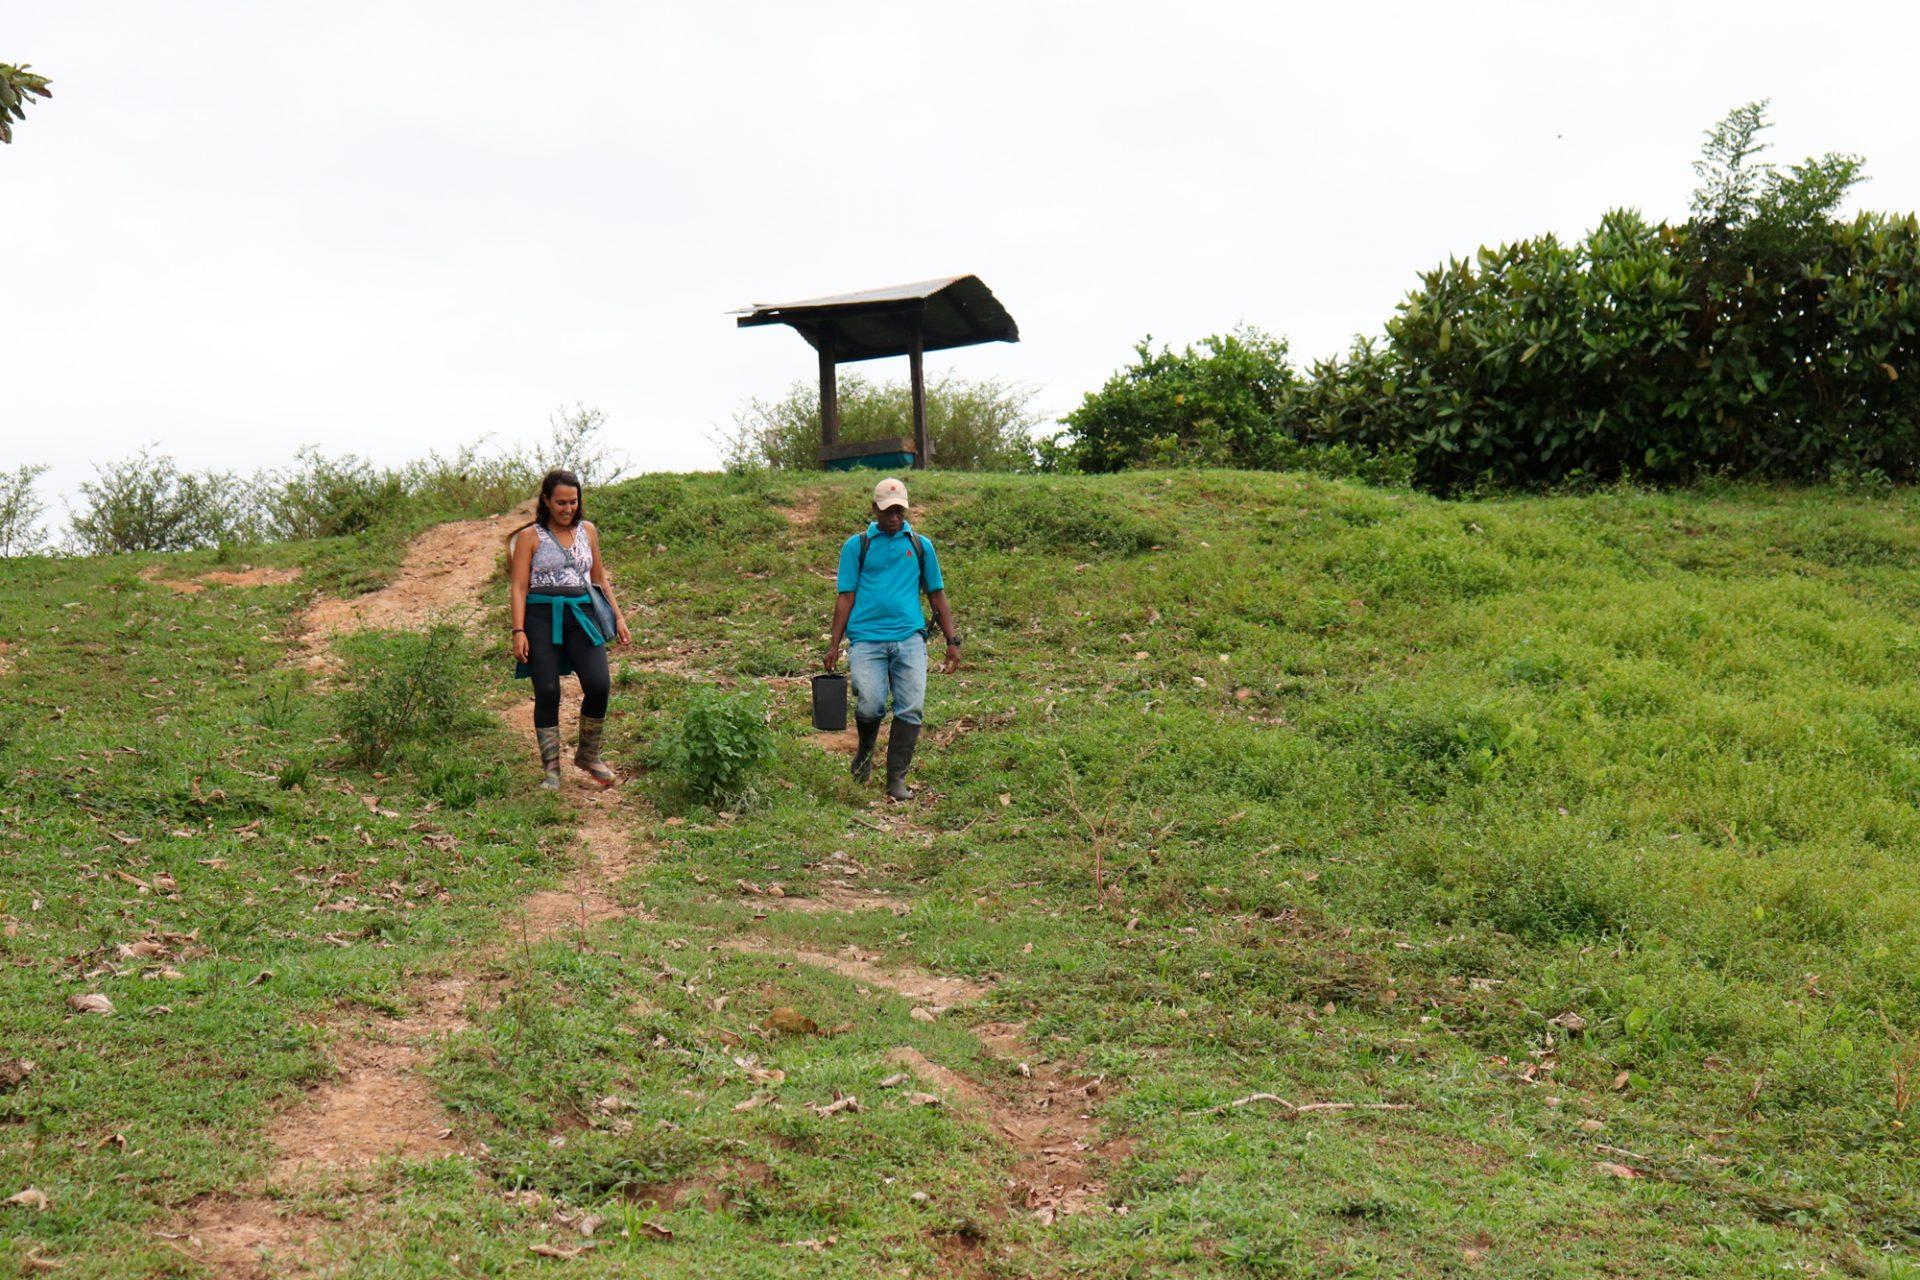 Bosque tropical, Vive la magia en Necocli